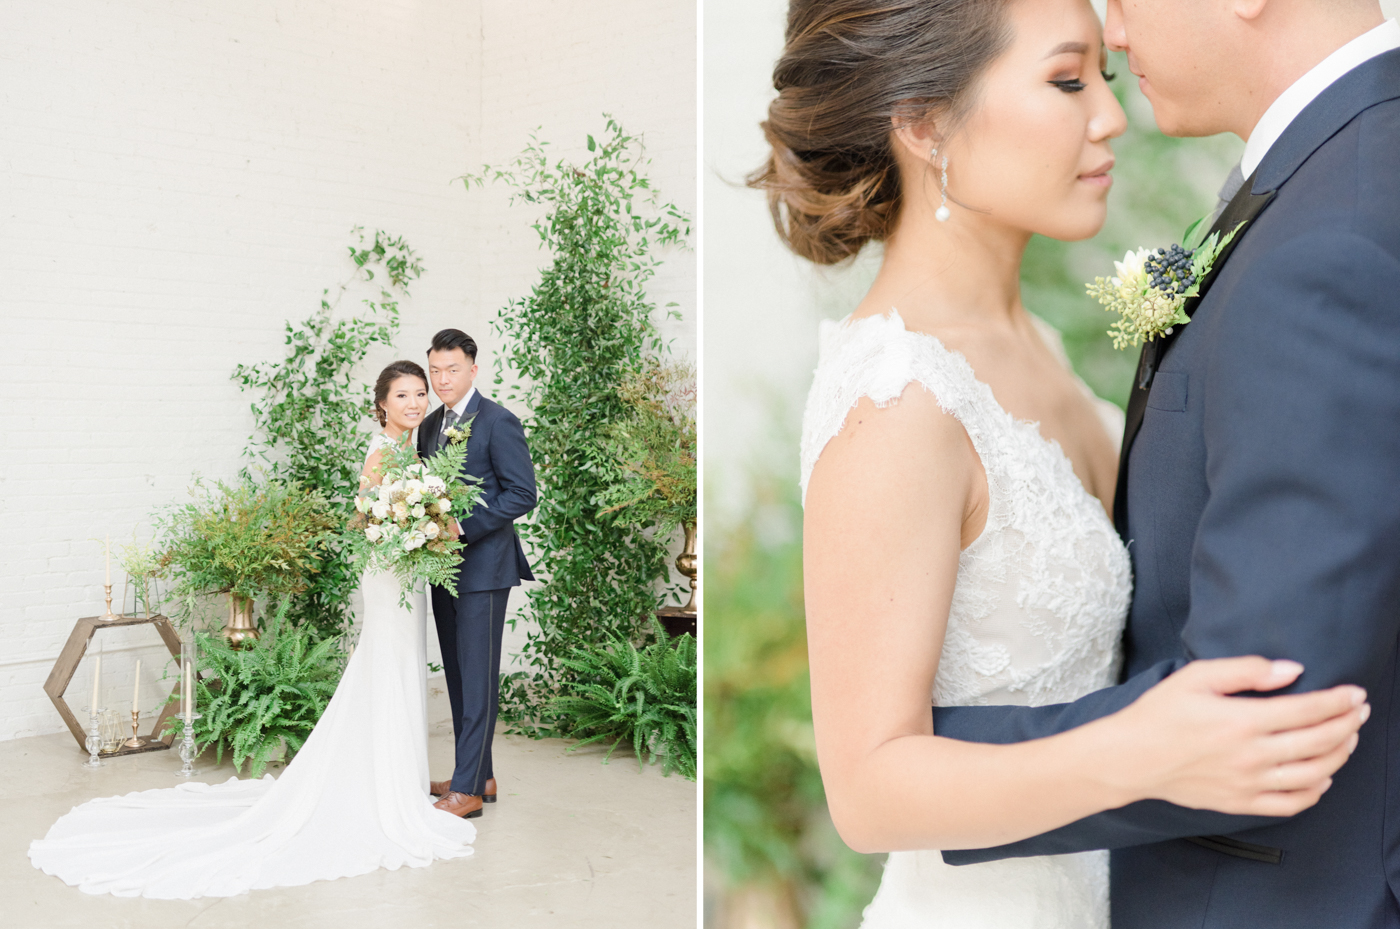 Modern_Wedding_HNYPT_Honeypot_LA_Photographer_Los_Angeles-11.jpg